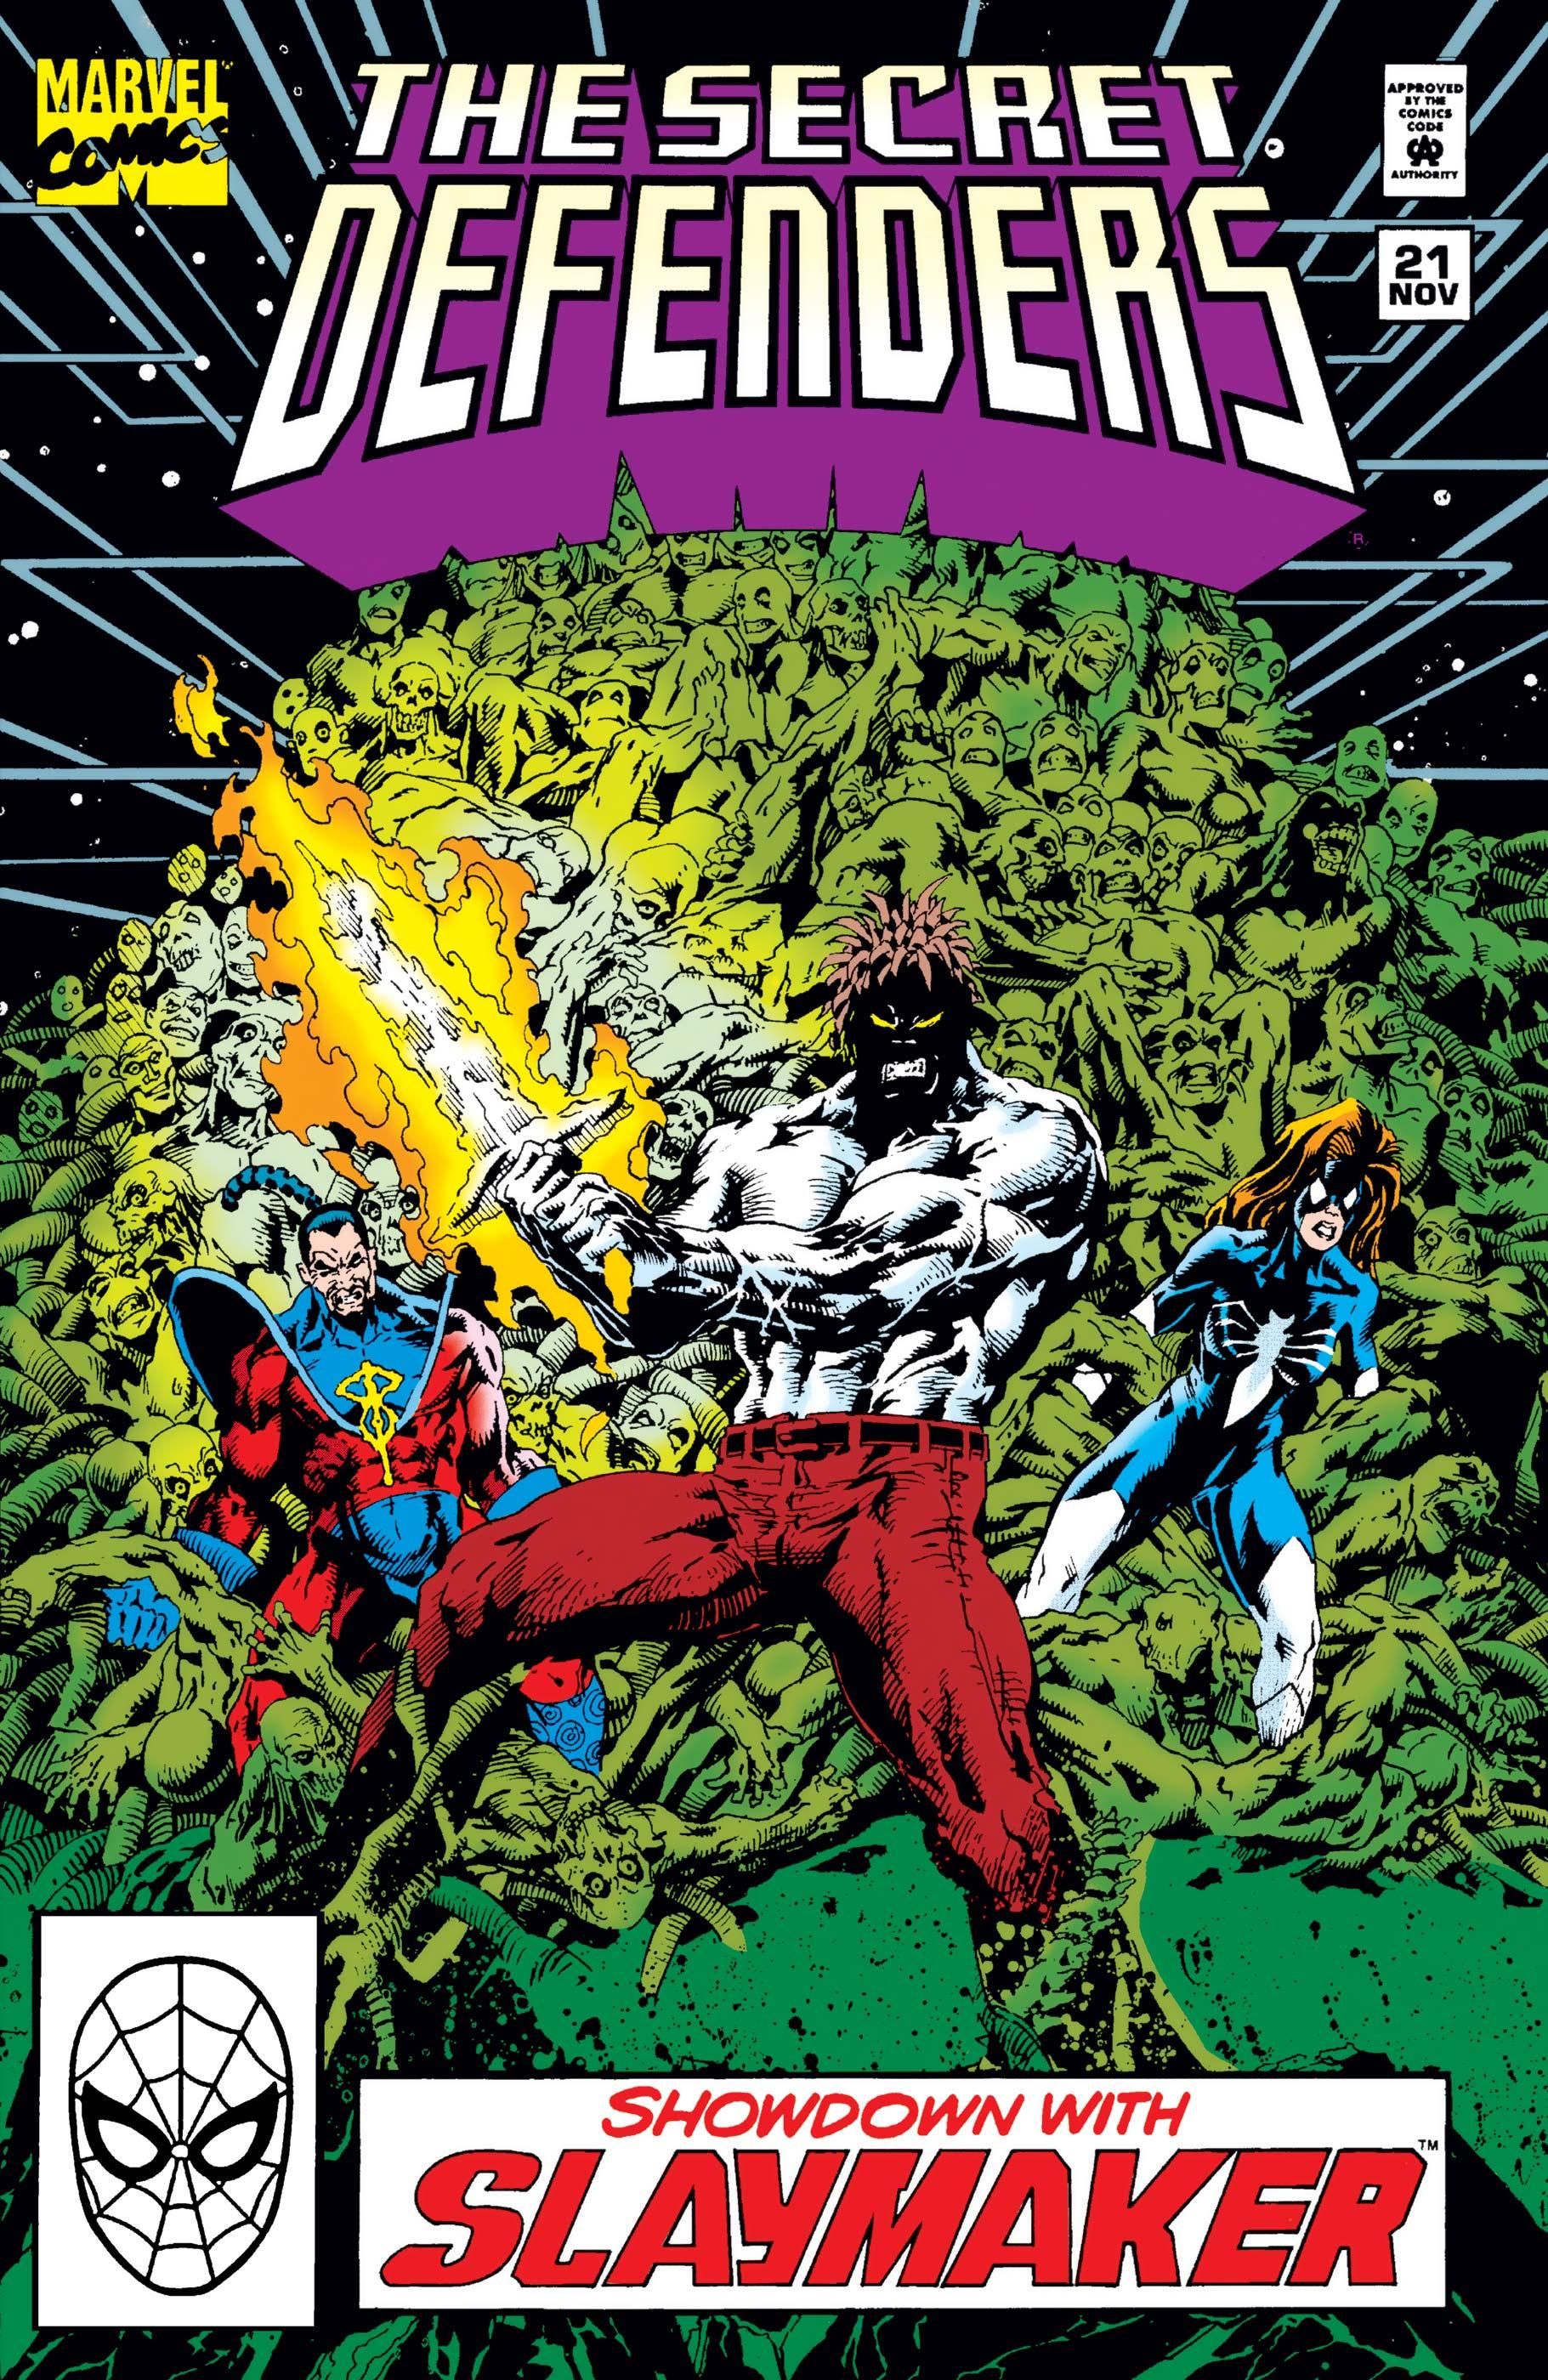 Secret Defenders (1993) #21